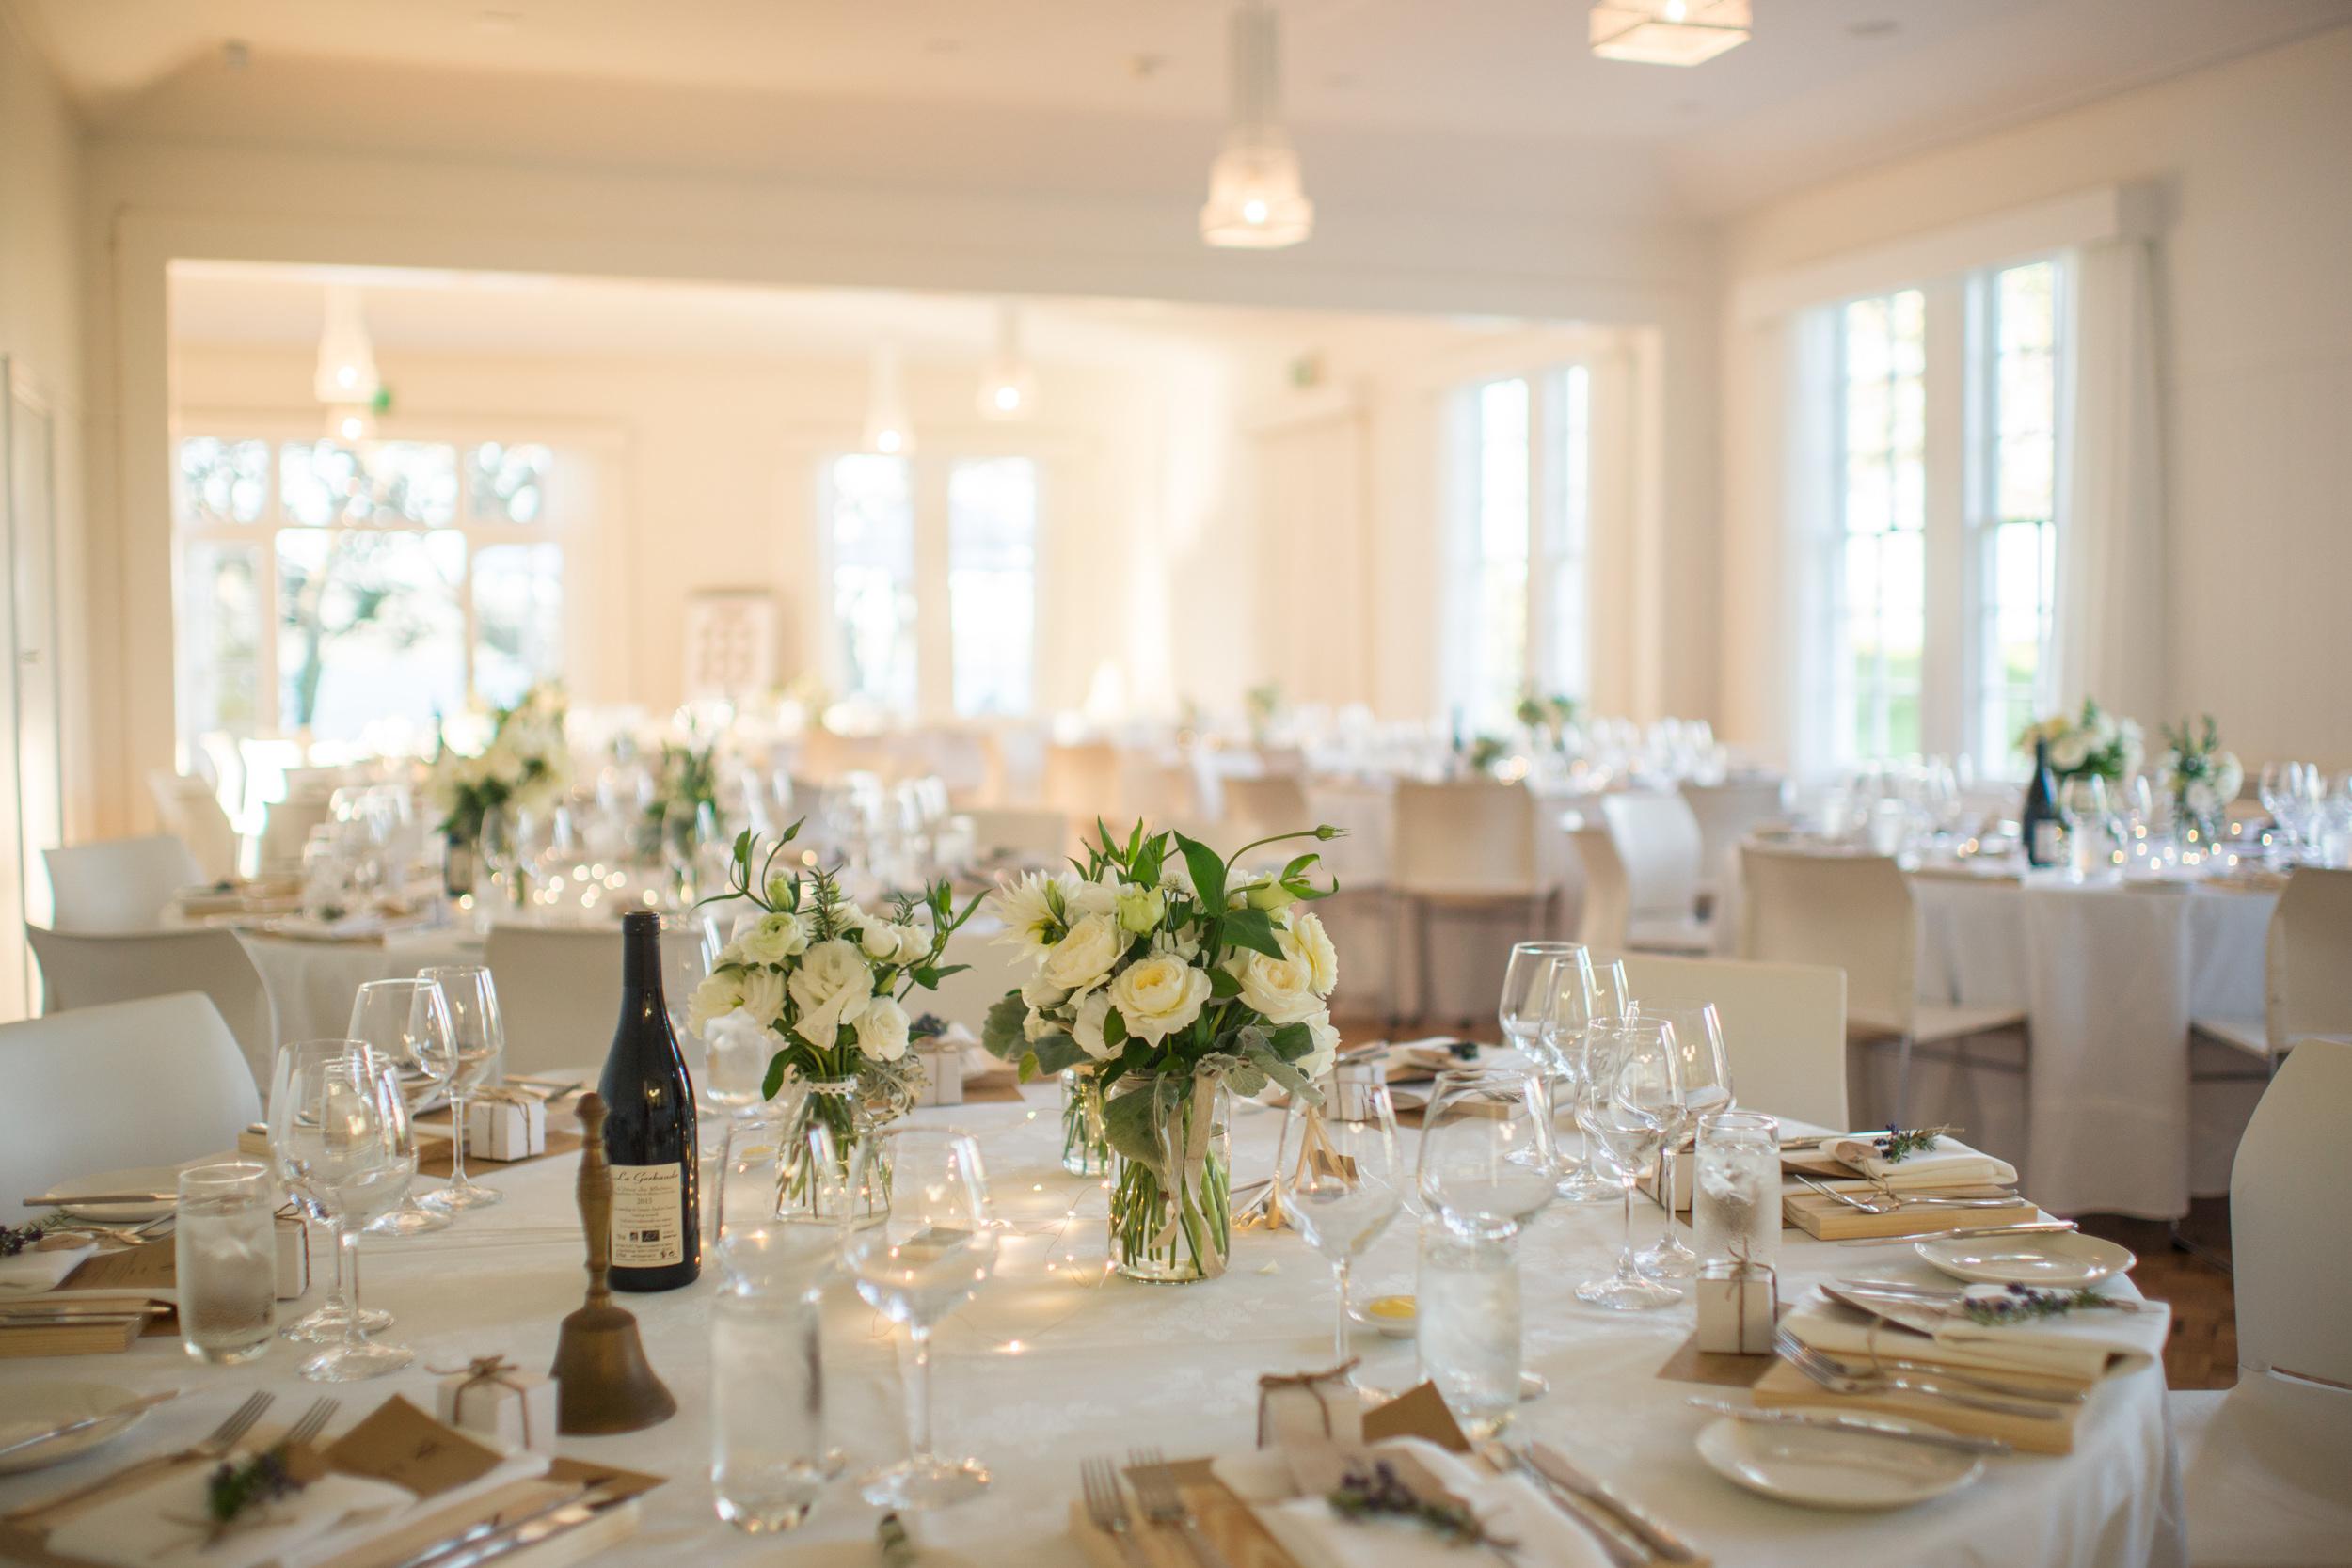 venues for weddings takapuna, north shore, auckland